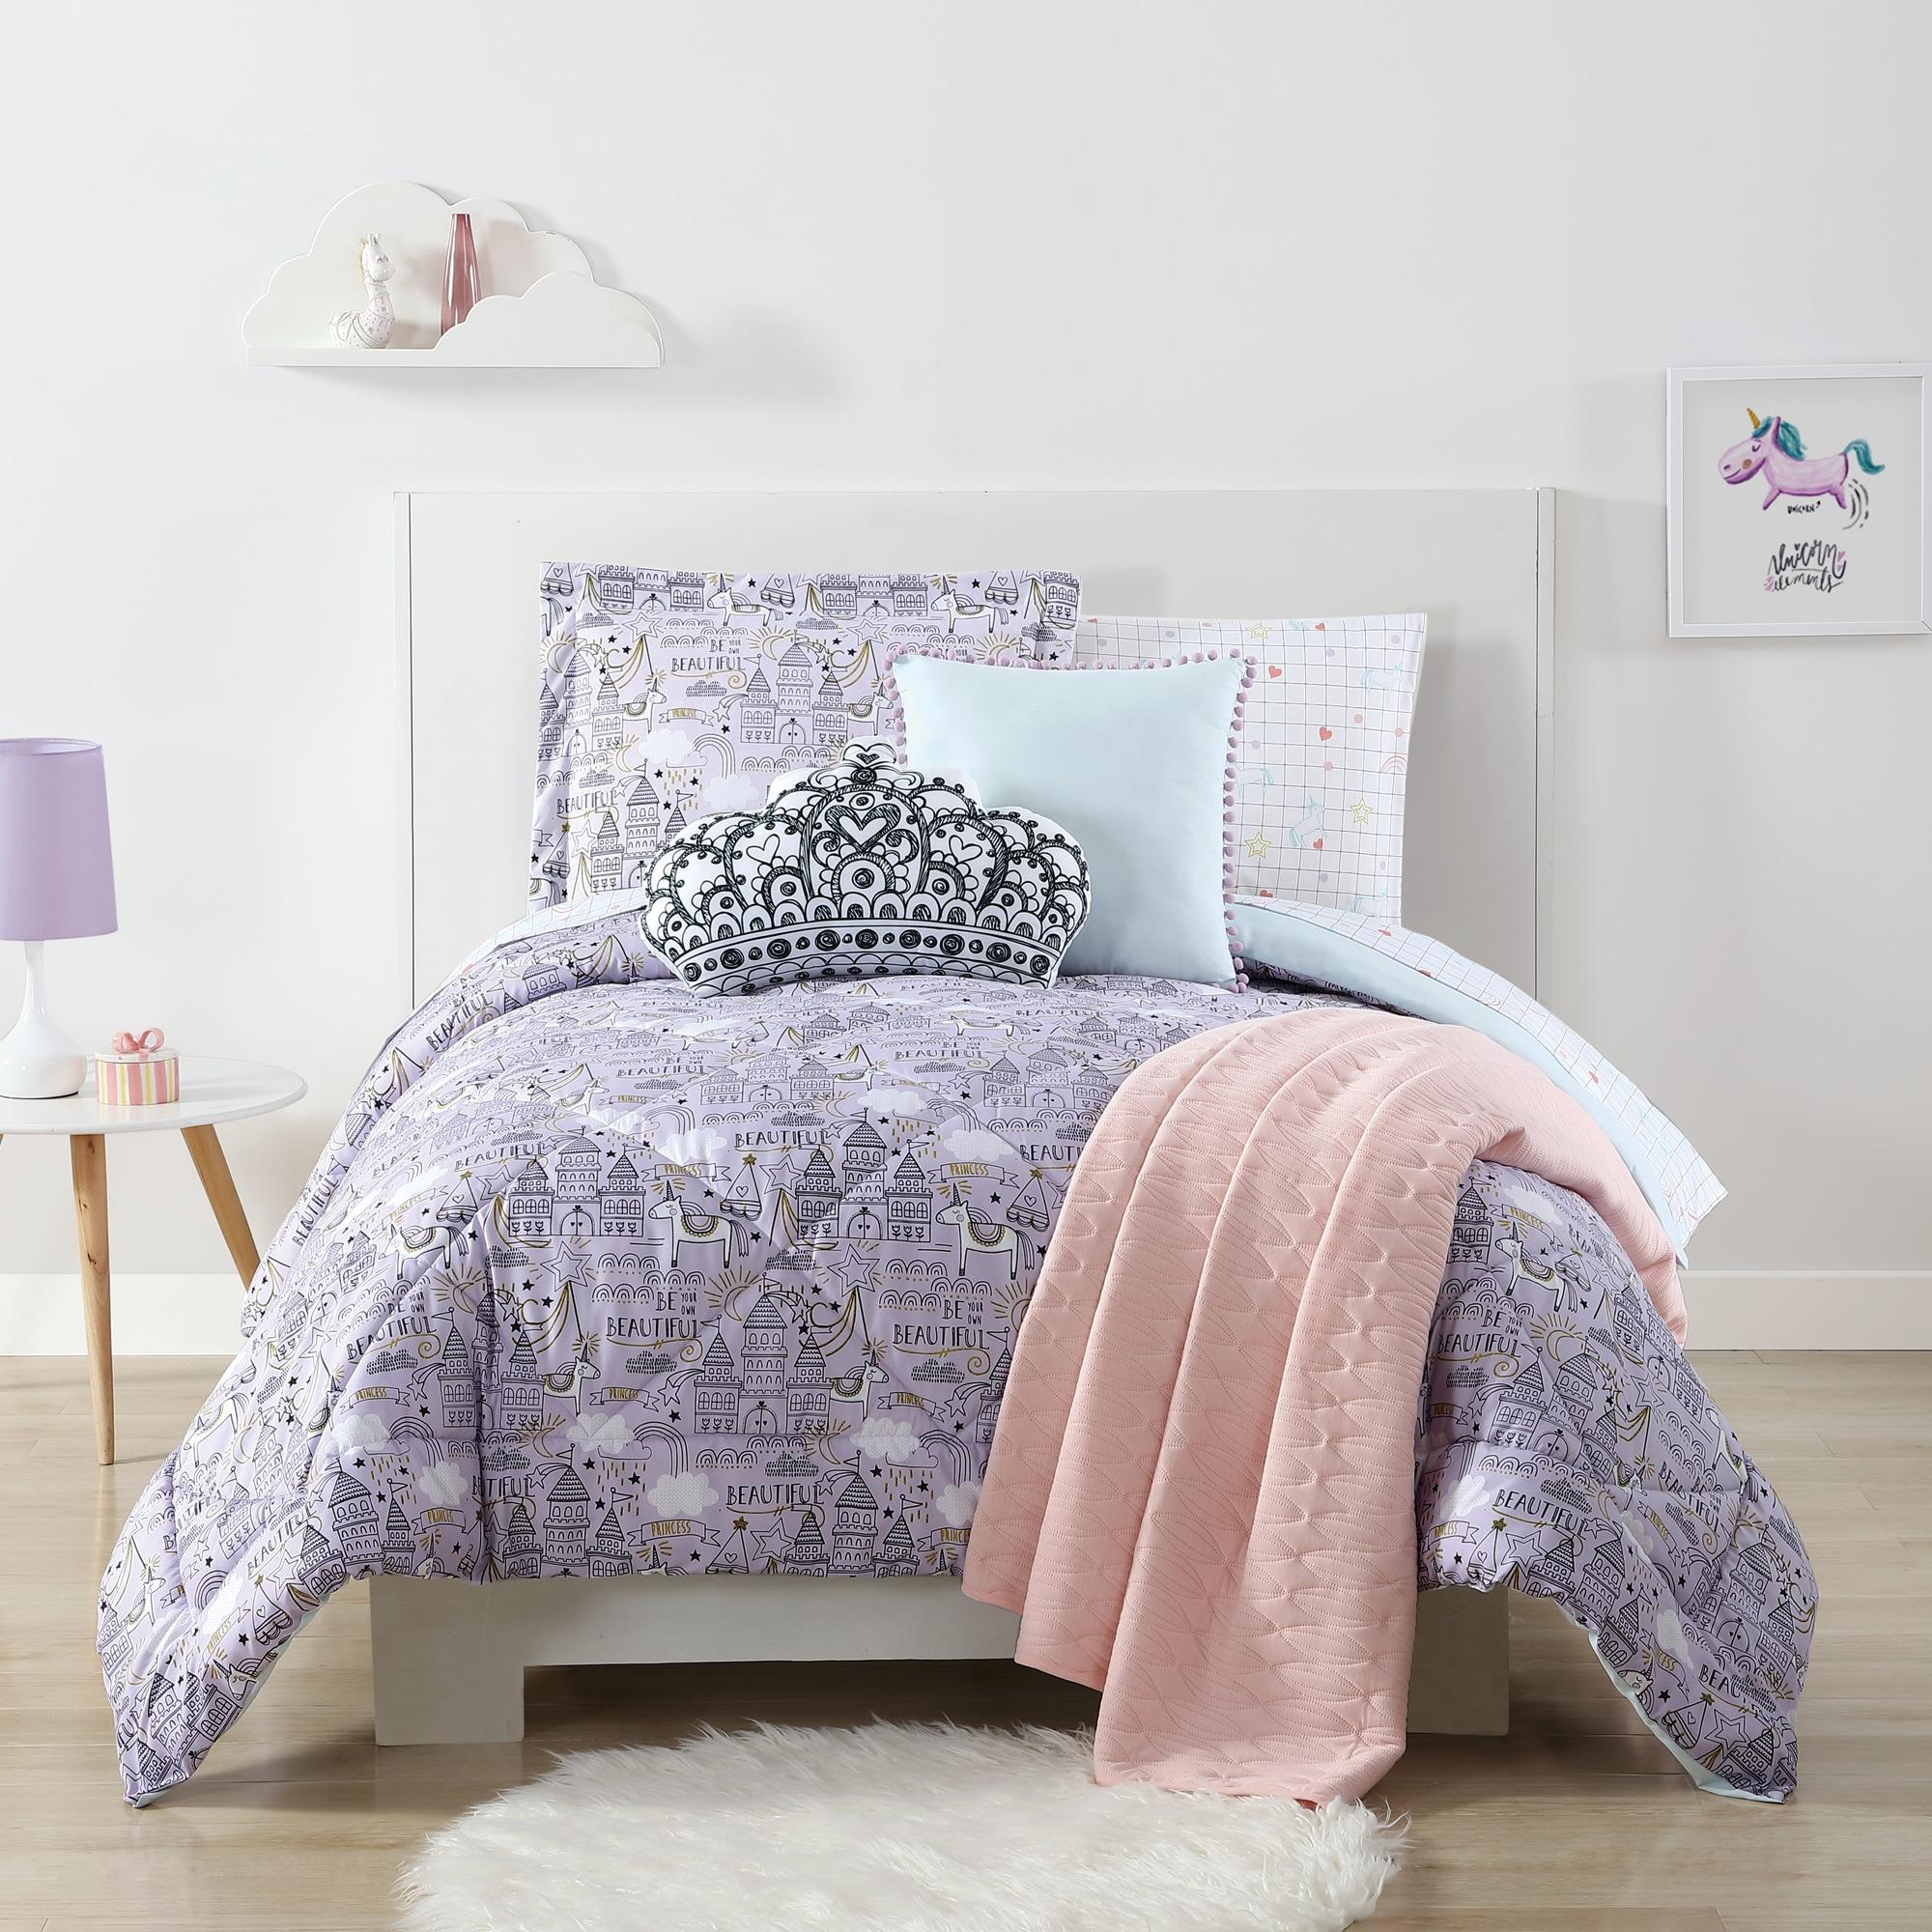 Princess Sofia Exclusive Designed Comfortable Girls Bedding Twin Comforter and Sham Set Purple